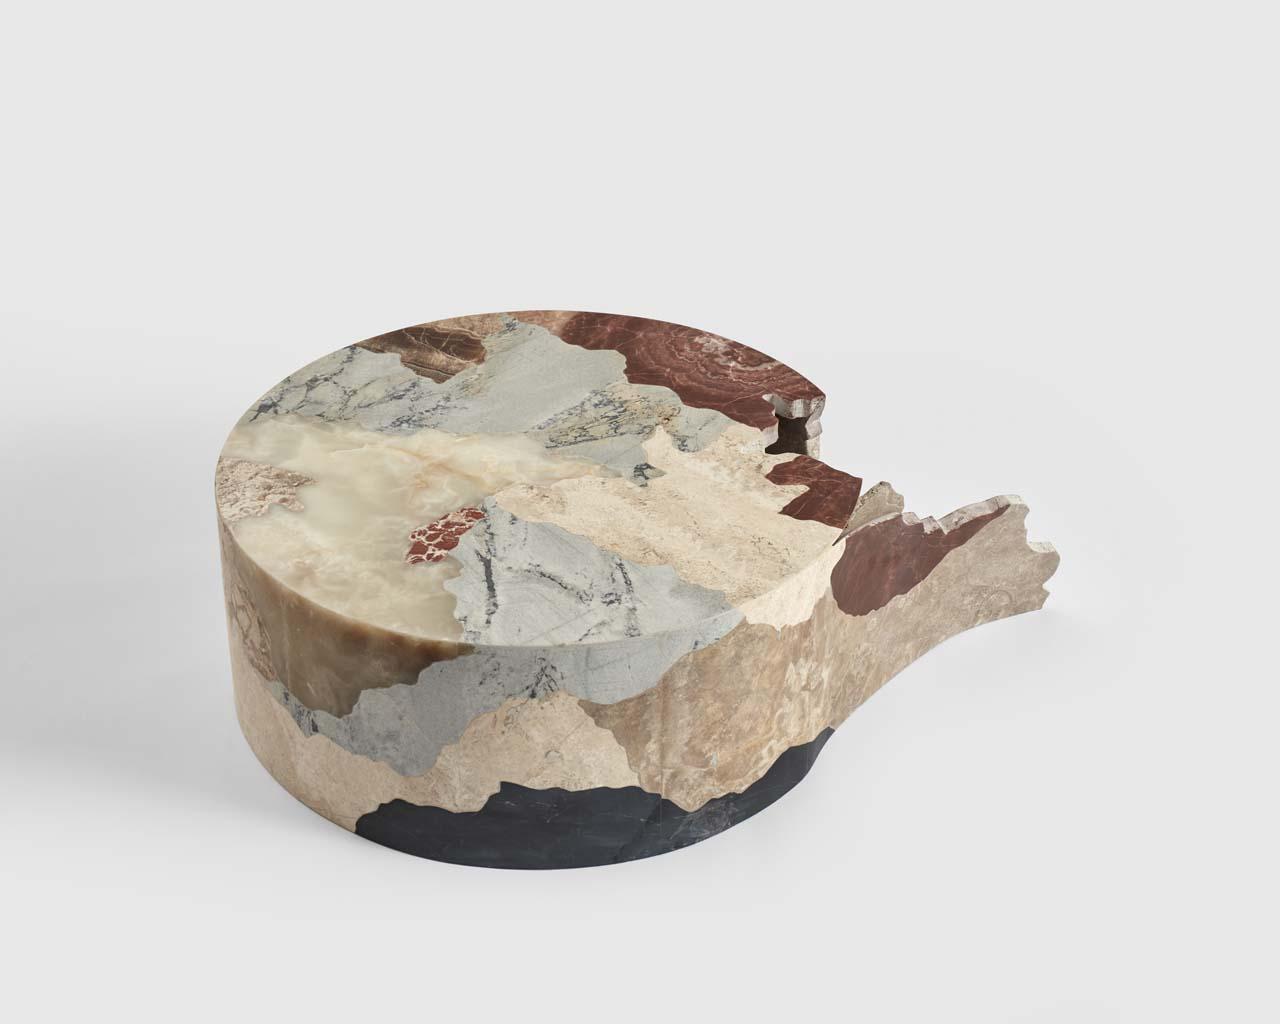 Escultura tallada a mano con distintas piedras del ande peruano. Handcarved sculpture with different rocks from Peruvian Andes.